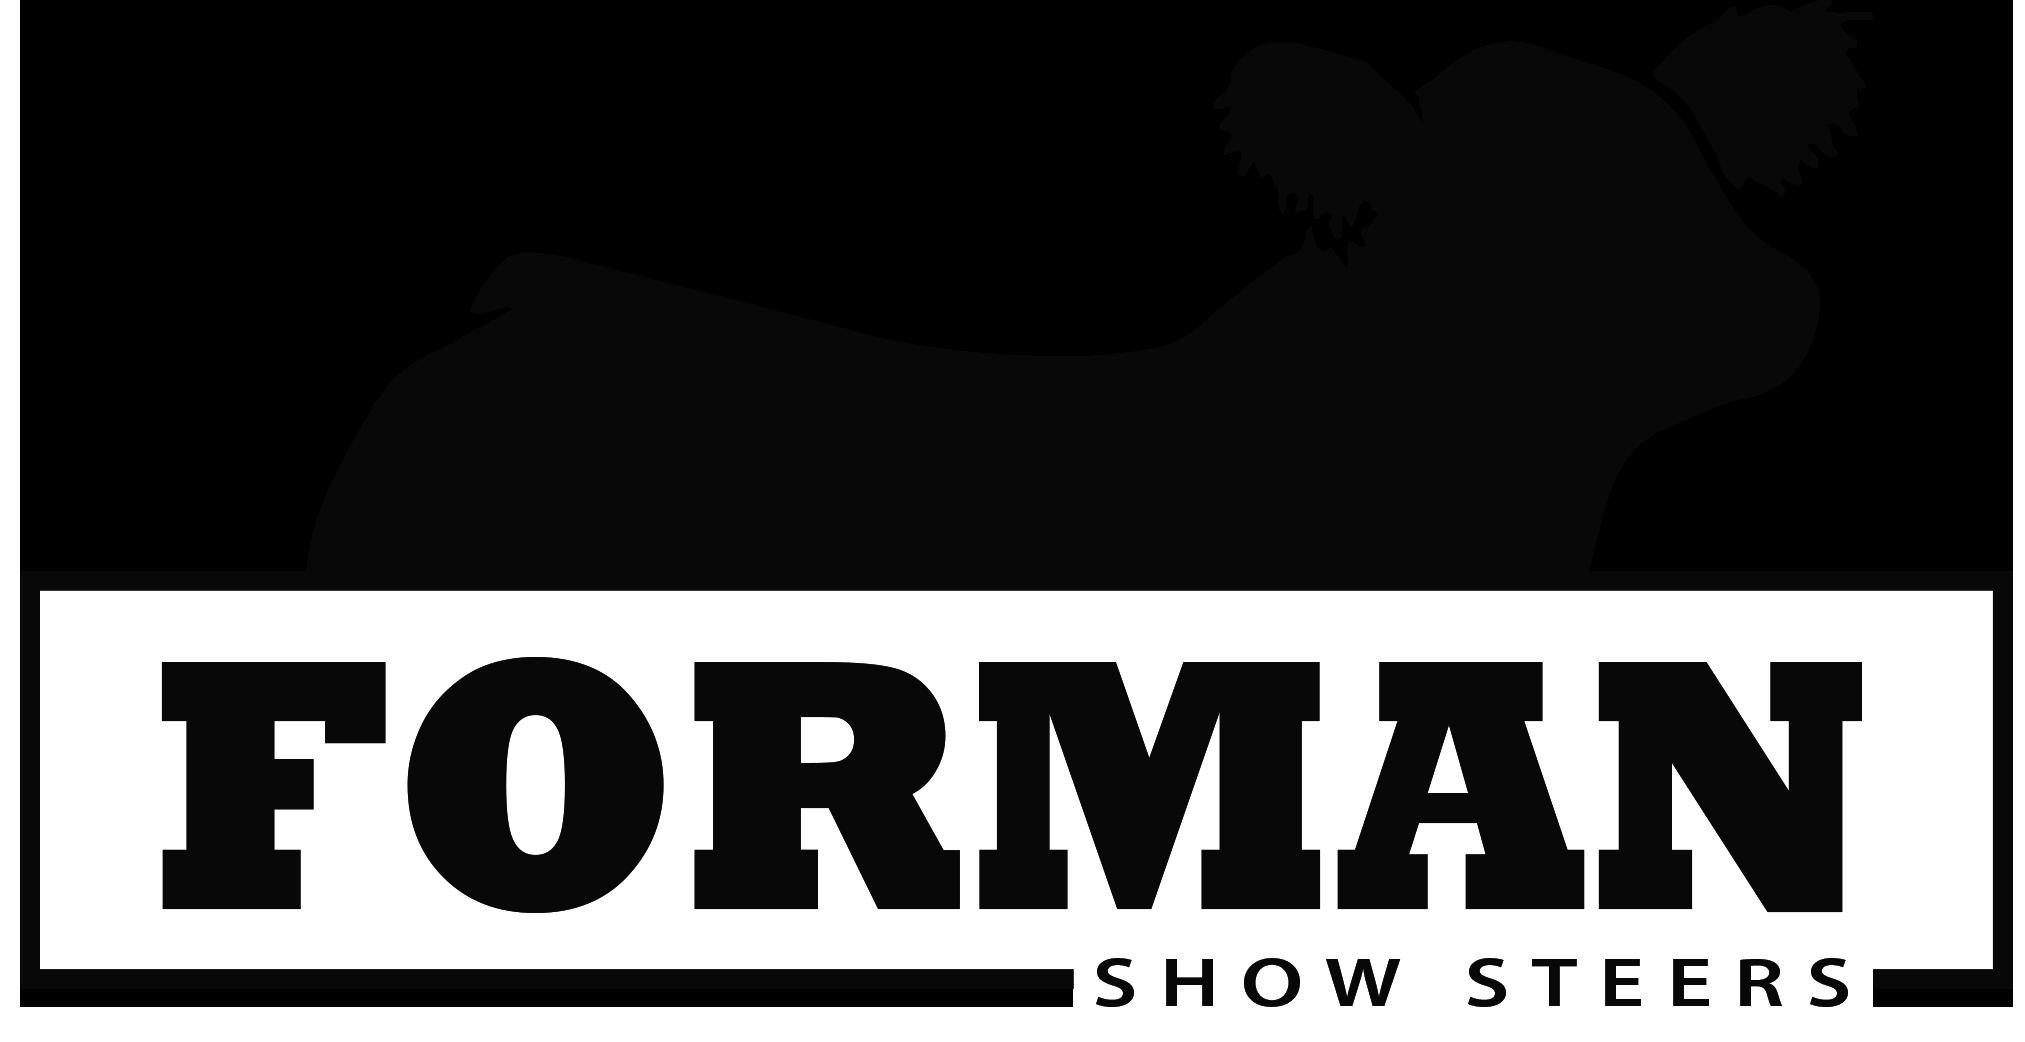 Forman Show Steers